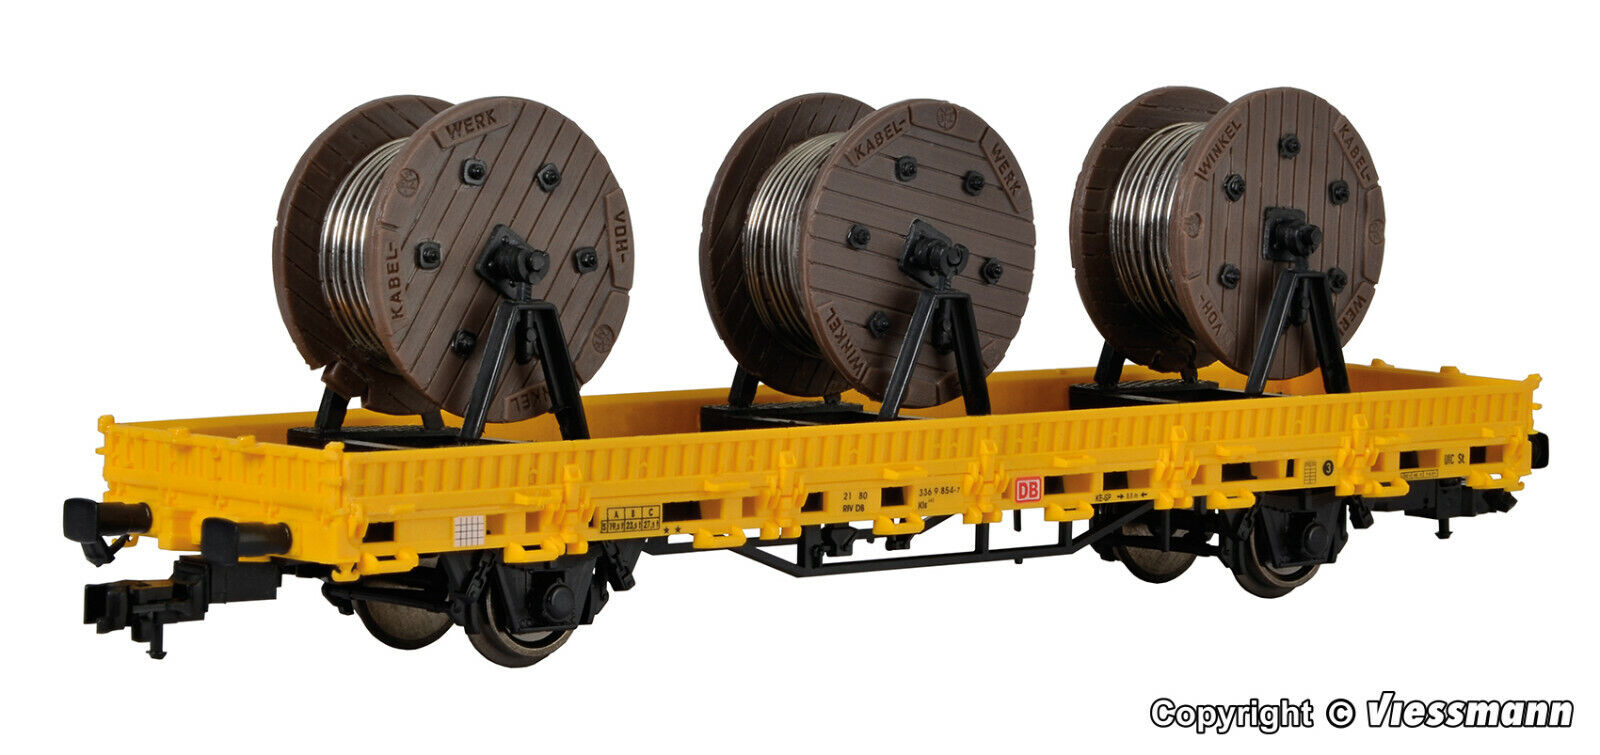 Kibri h0 26269 listo modelo baja bordo Cochero gleisbau m. 3 cable roles nuevo en el embalaje original